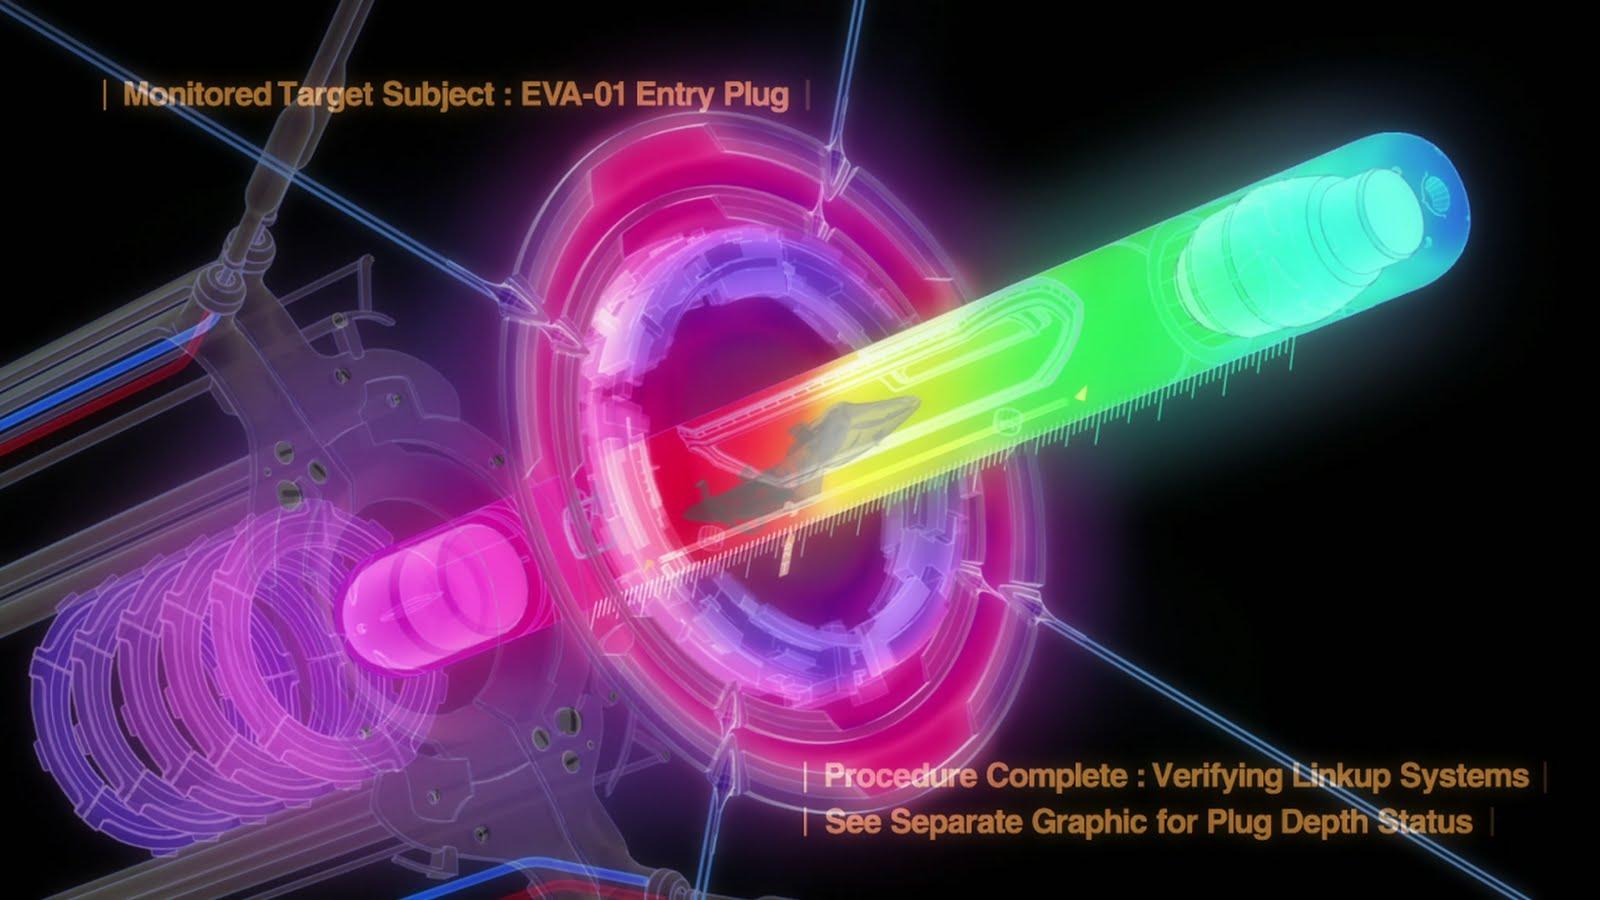 Desktop Wallpapers Naughty Animated Computer Graphics